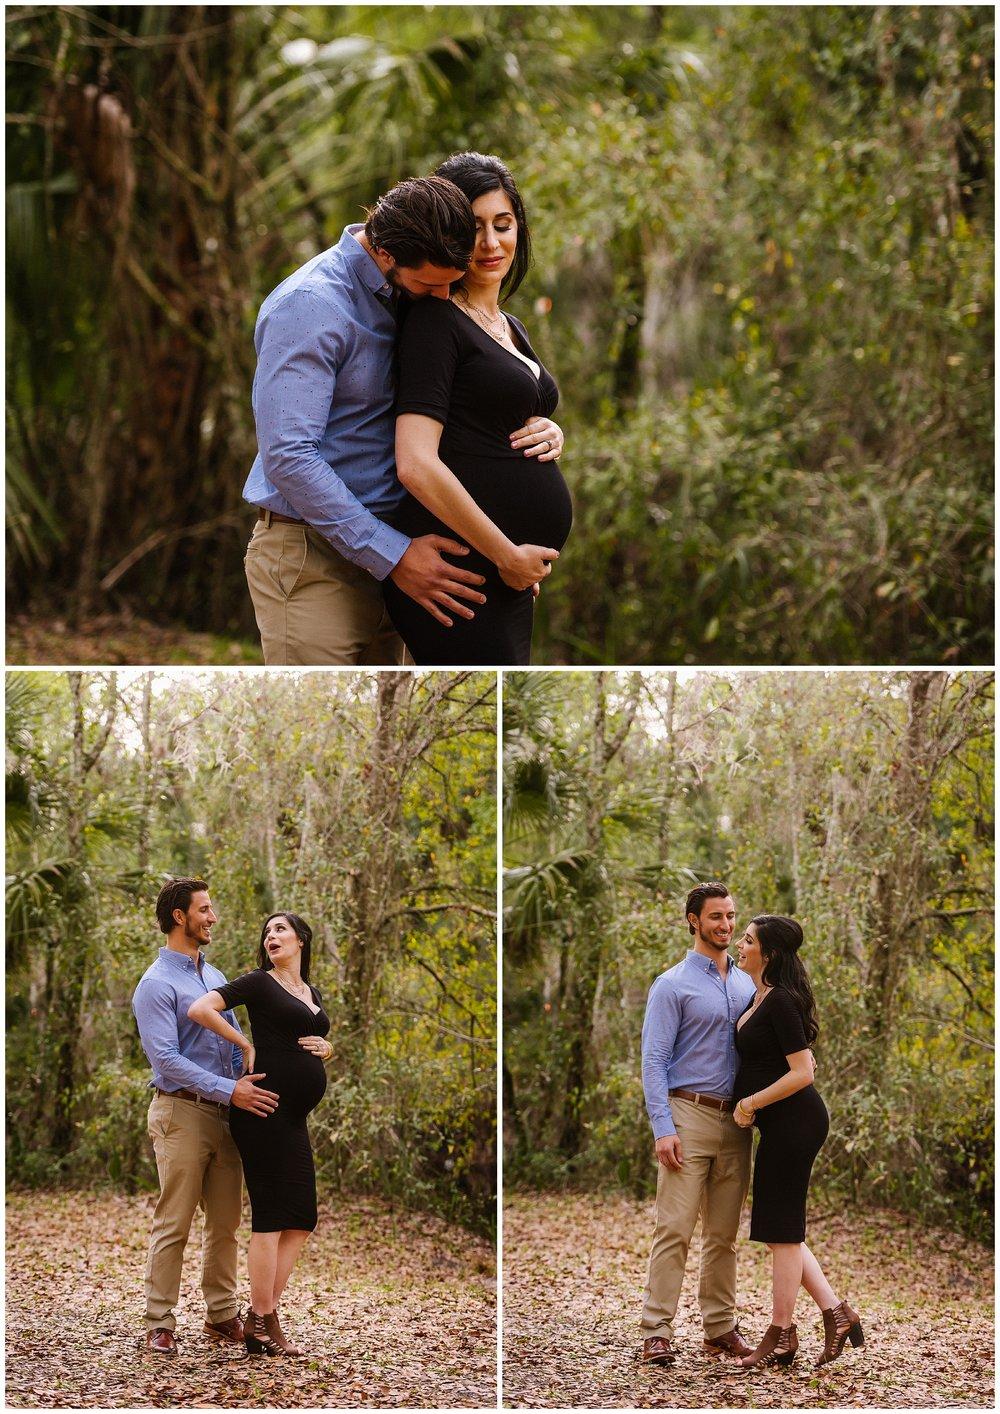 Tampa-maternity-photographer-morris-bridge-park-hip-tight-black-dress-woods_0004.jpg